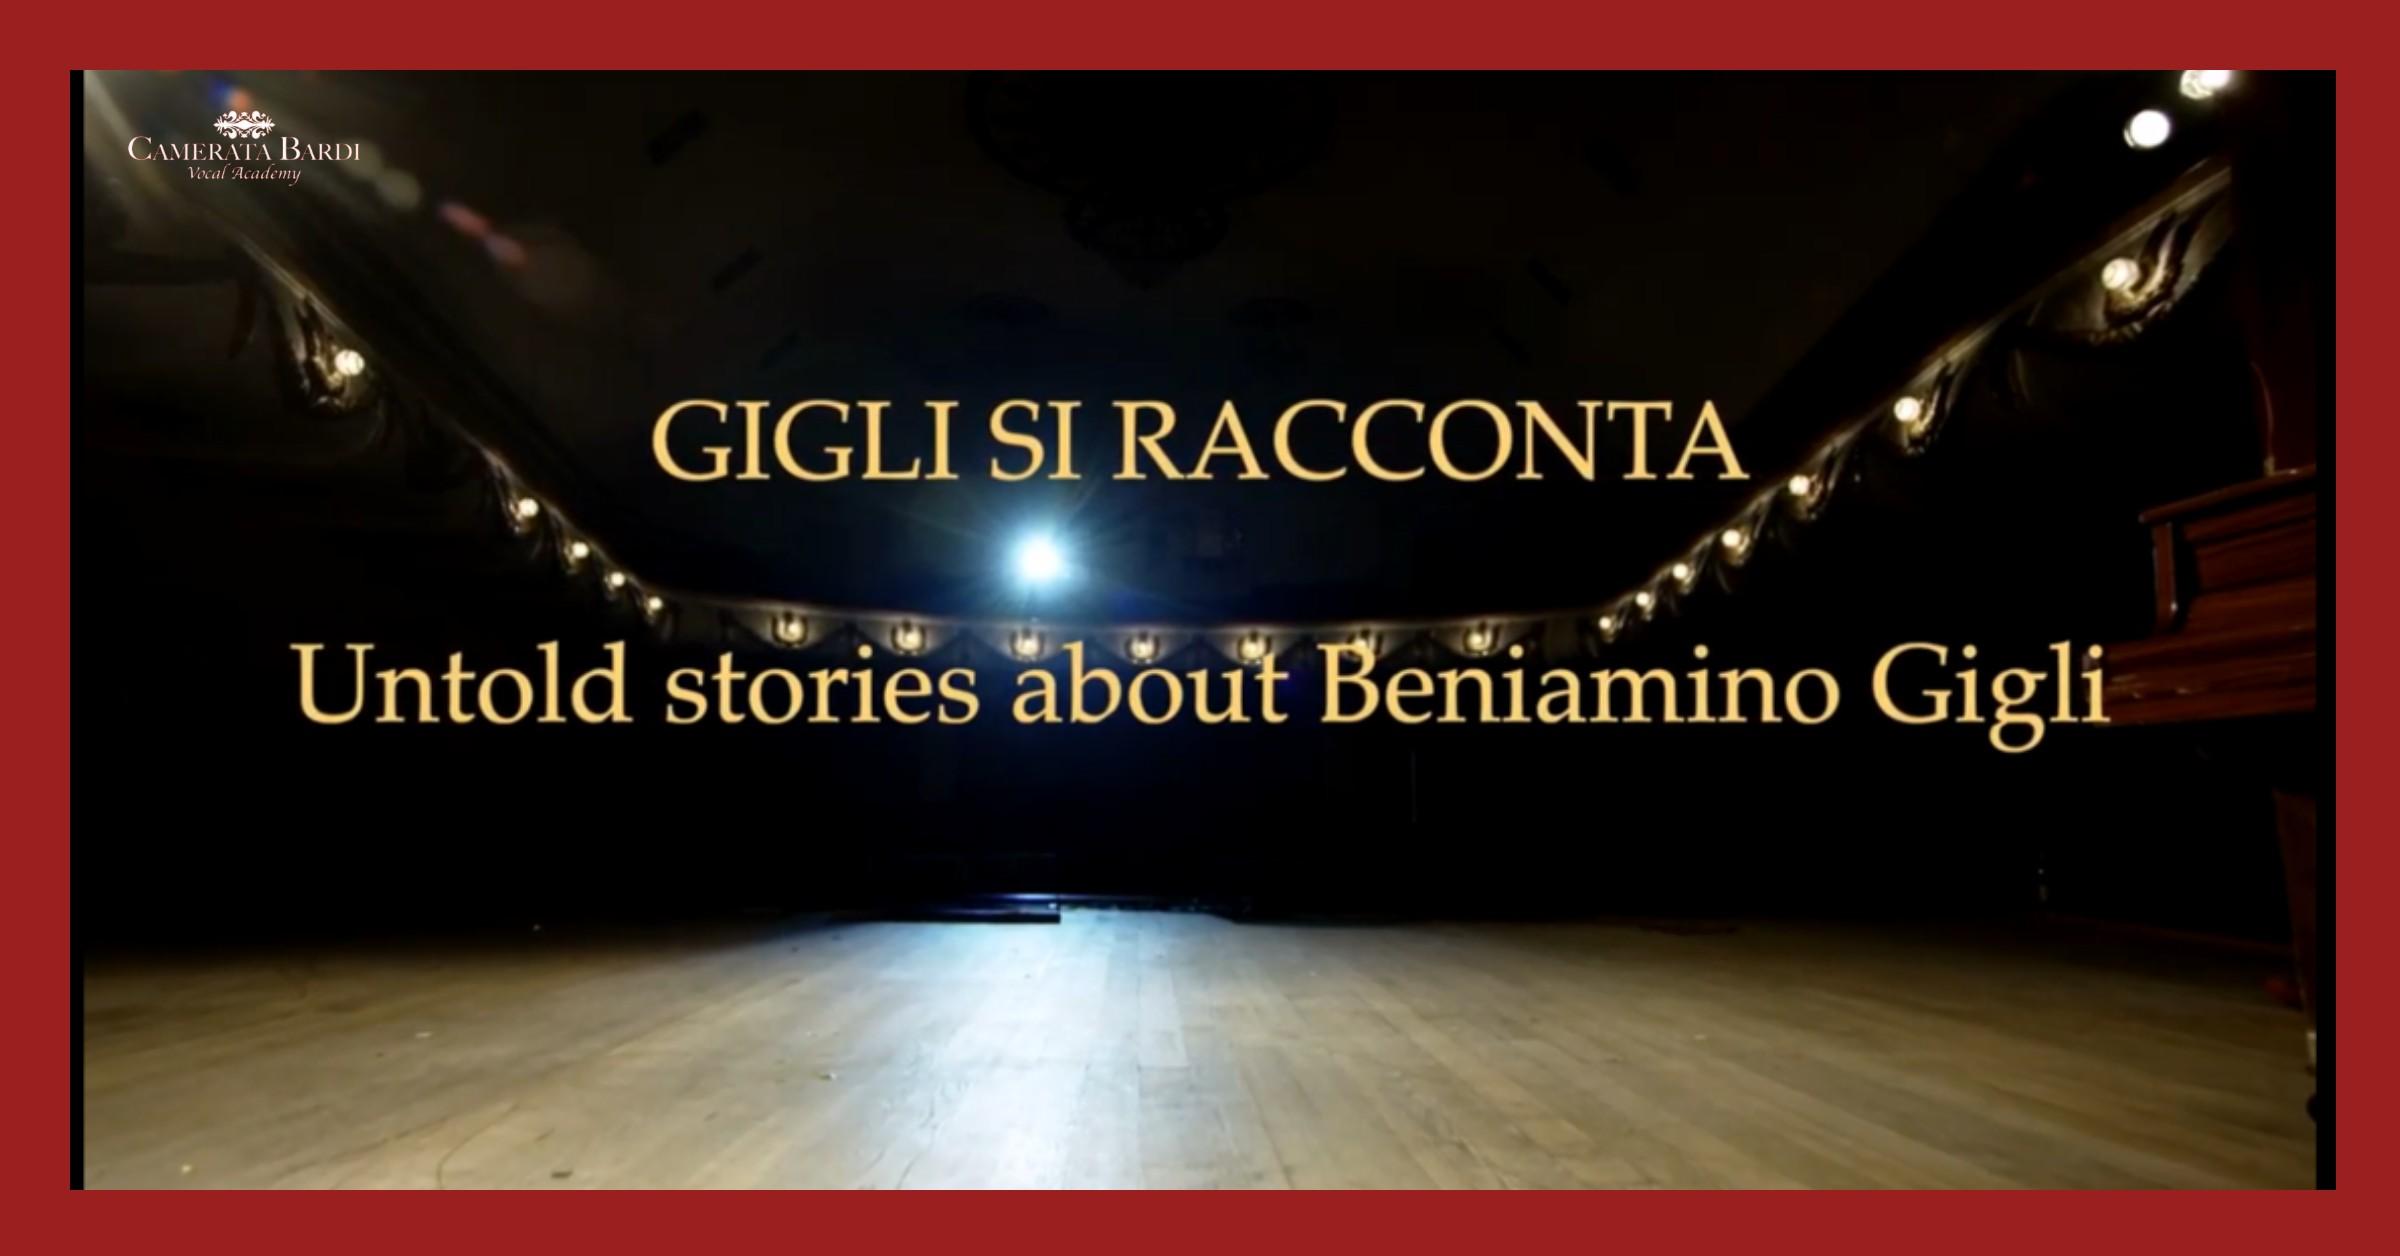 GIGLI SI RACCONTA | UNTOLD STORIES ABOUT BENIAMINO GIGLI